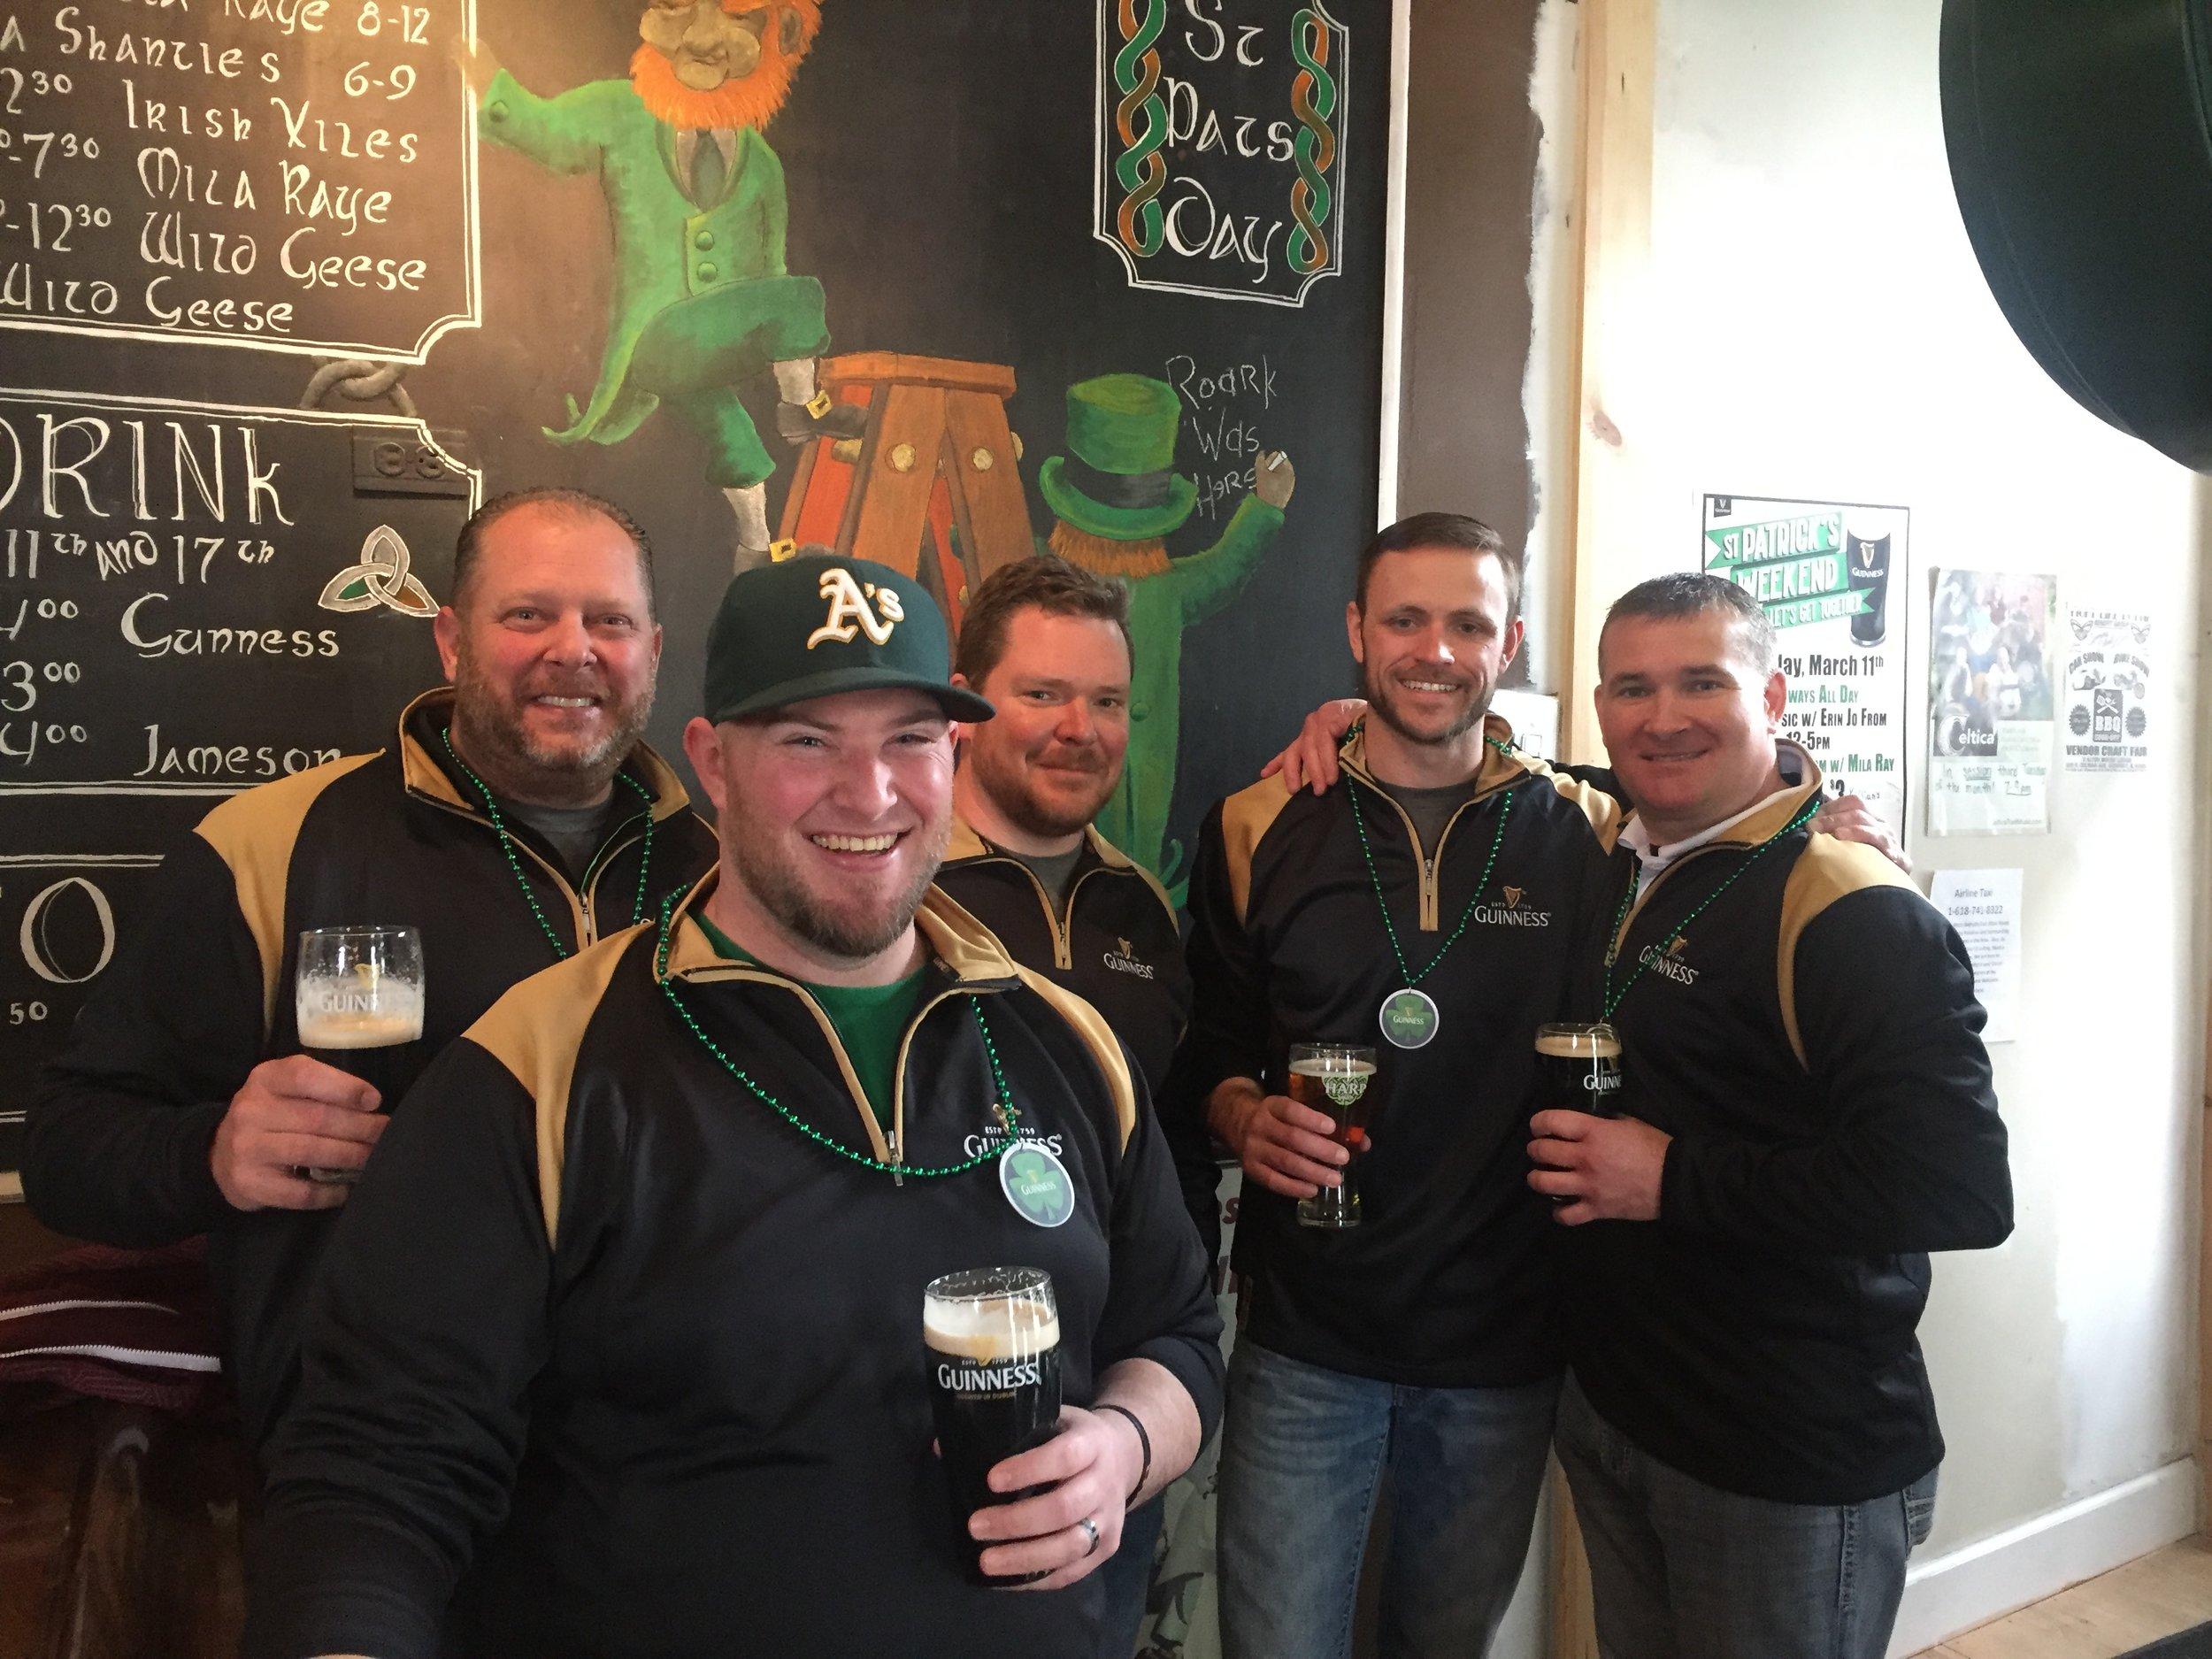 Alton St. Patrick's Day Pub Crawl